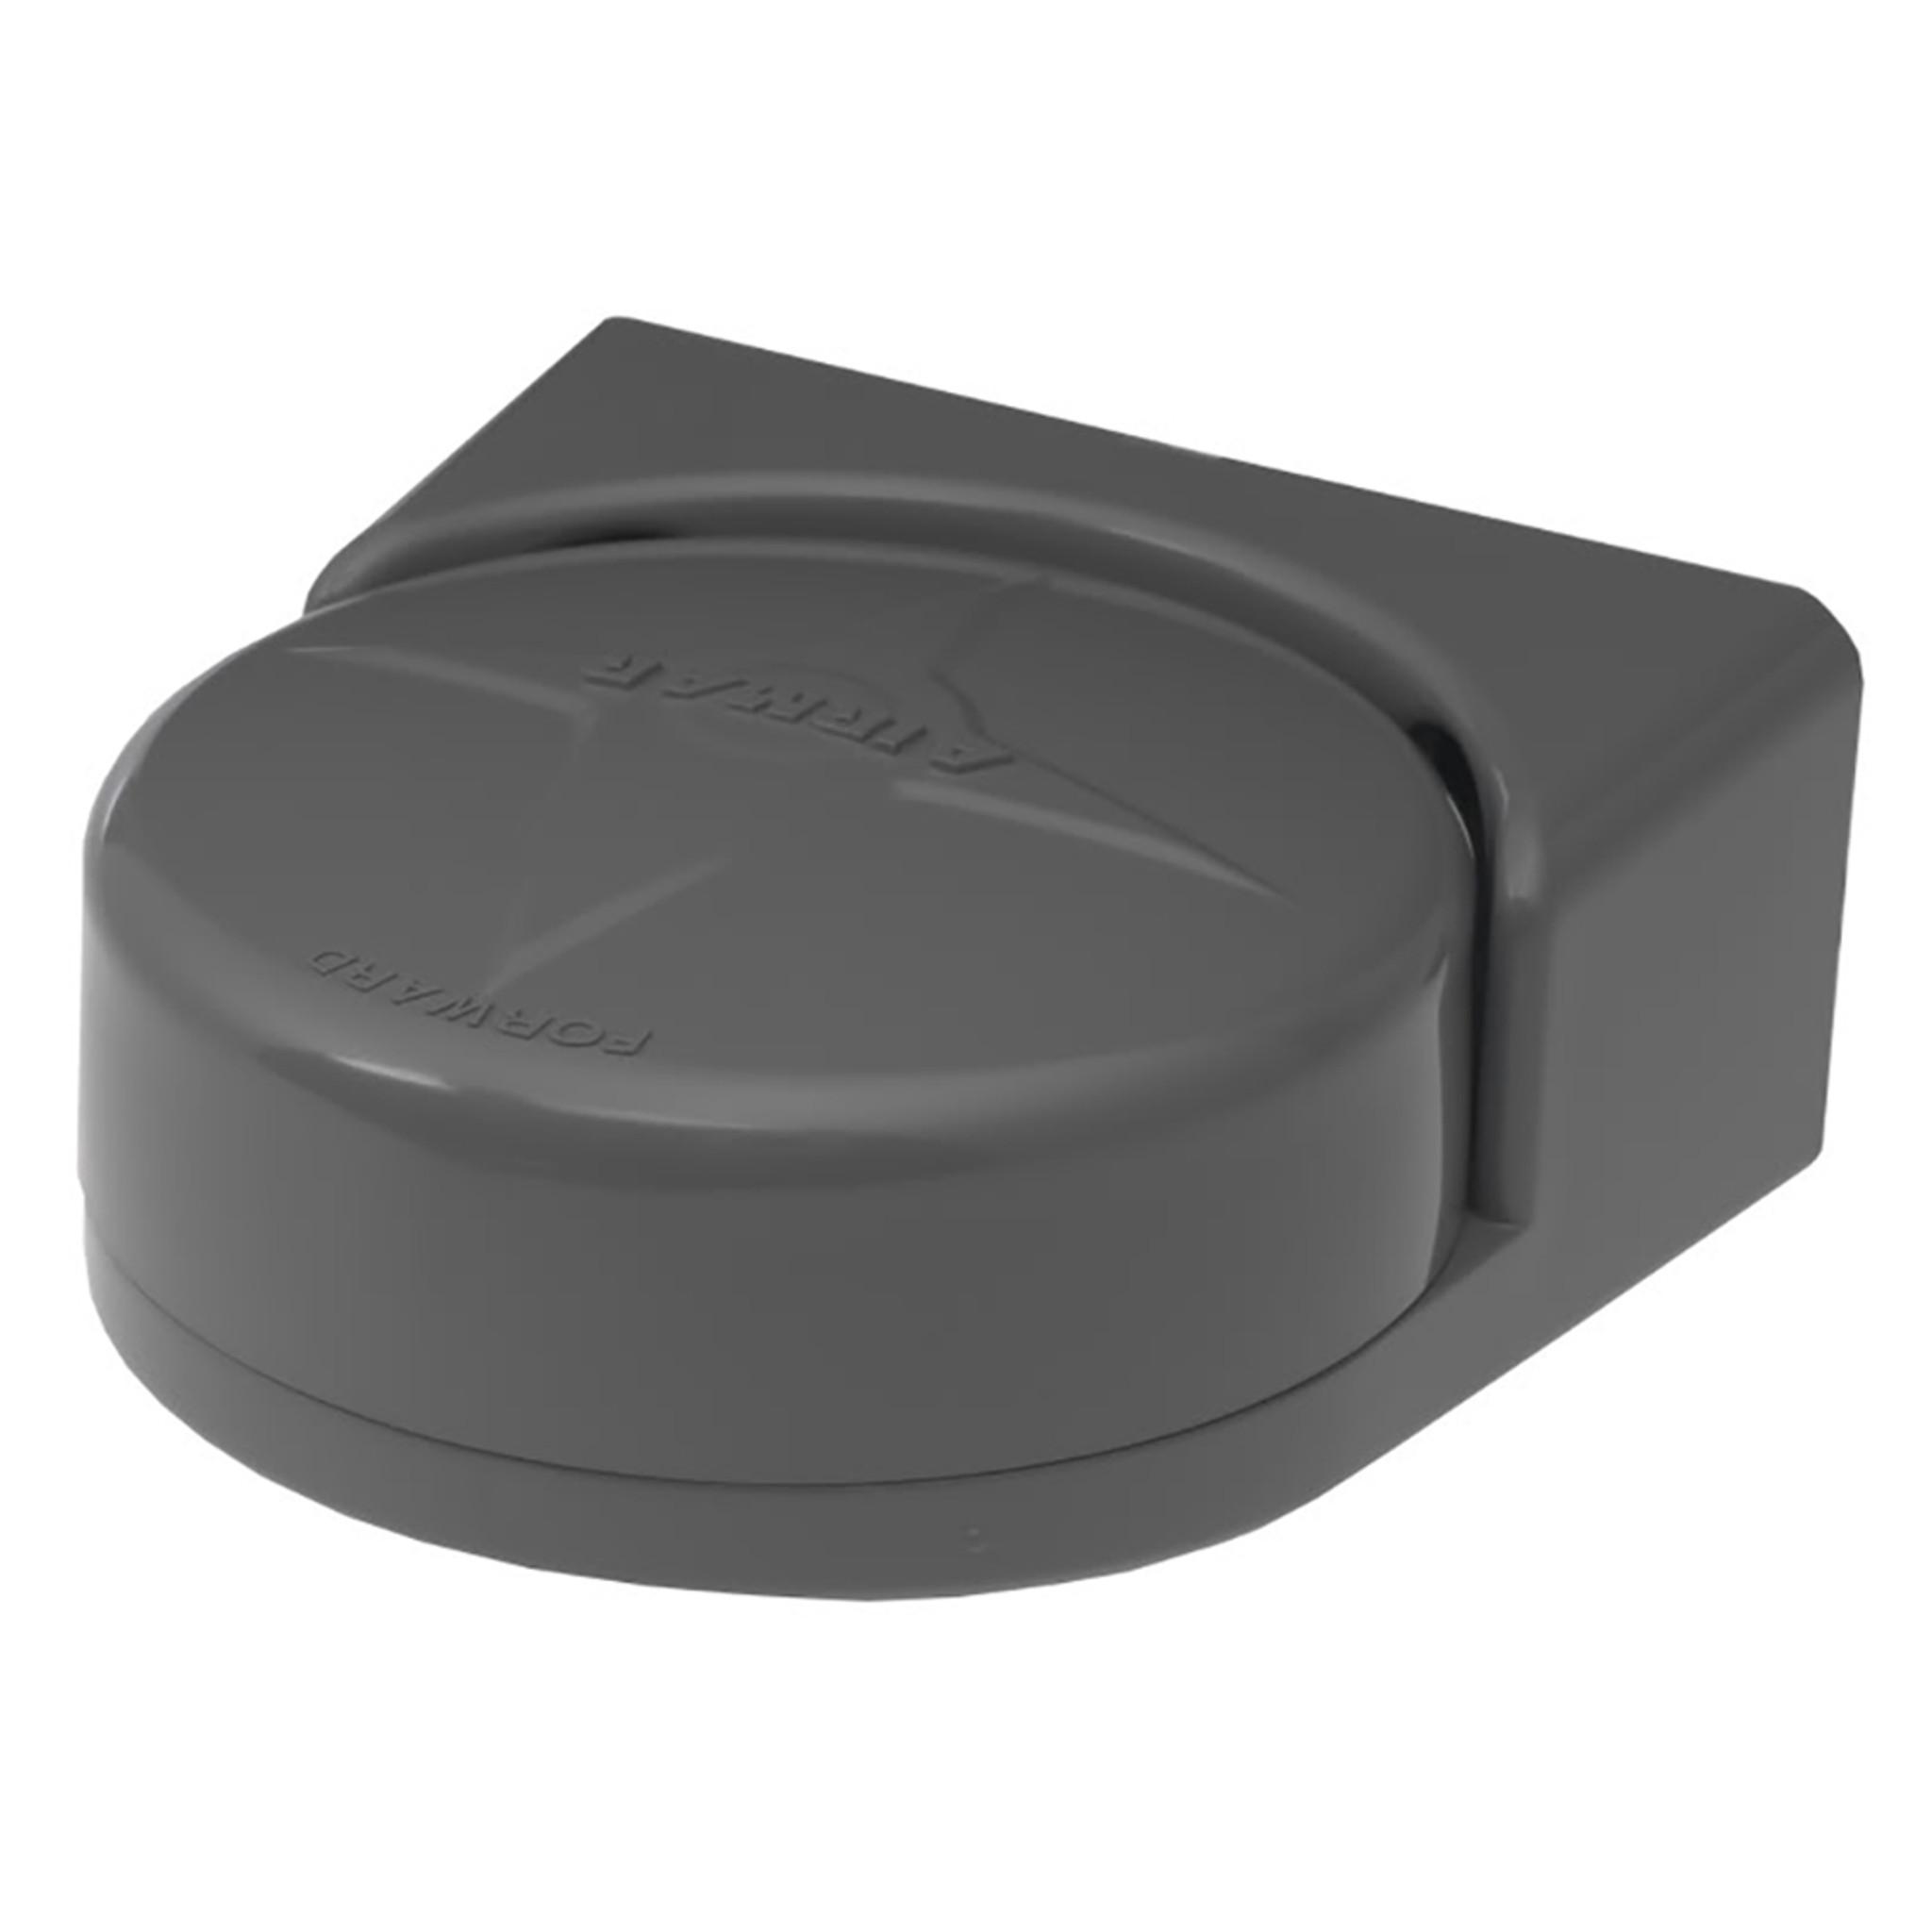 Airmar WS2-C06 NMEA 2000 Cable f//Heading Sensor Weather WS2-C06